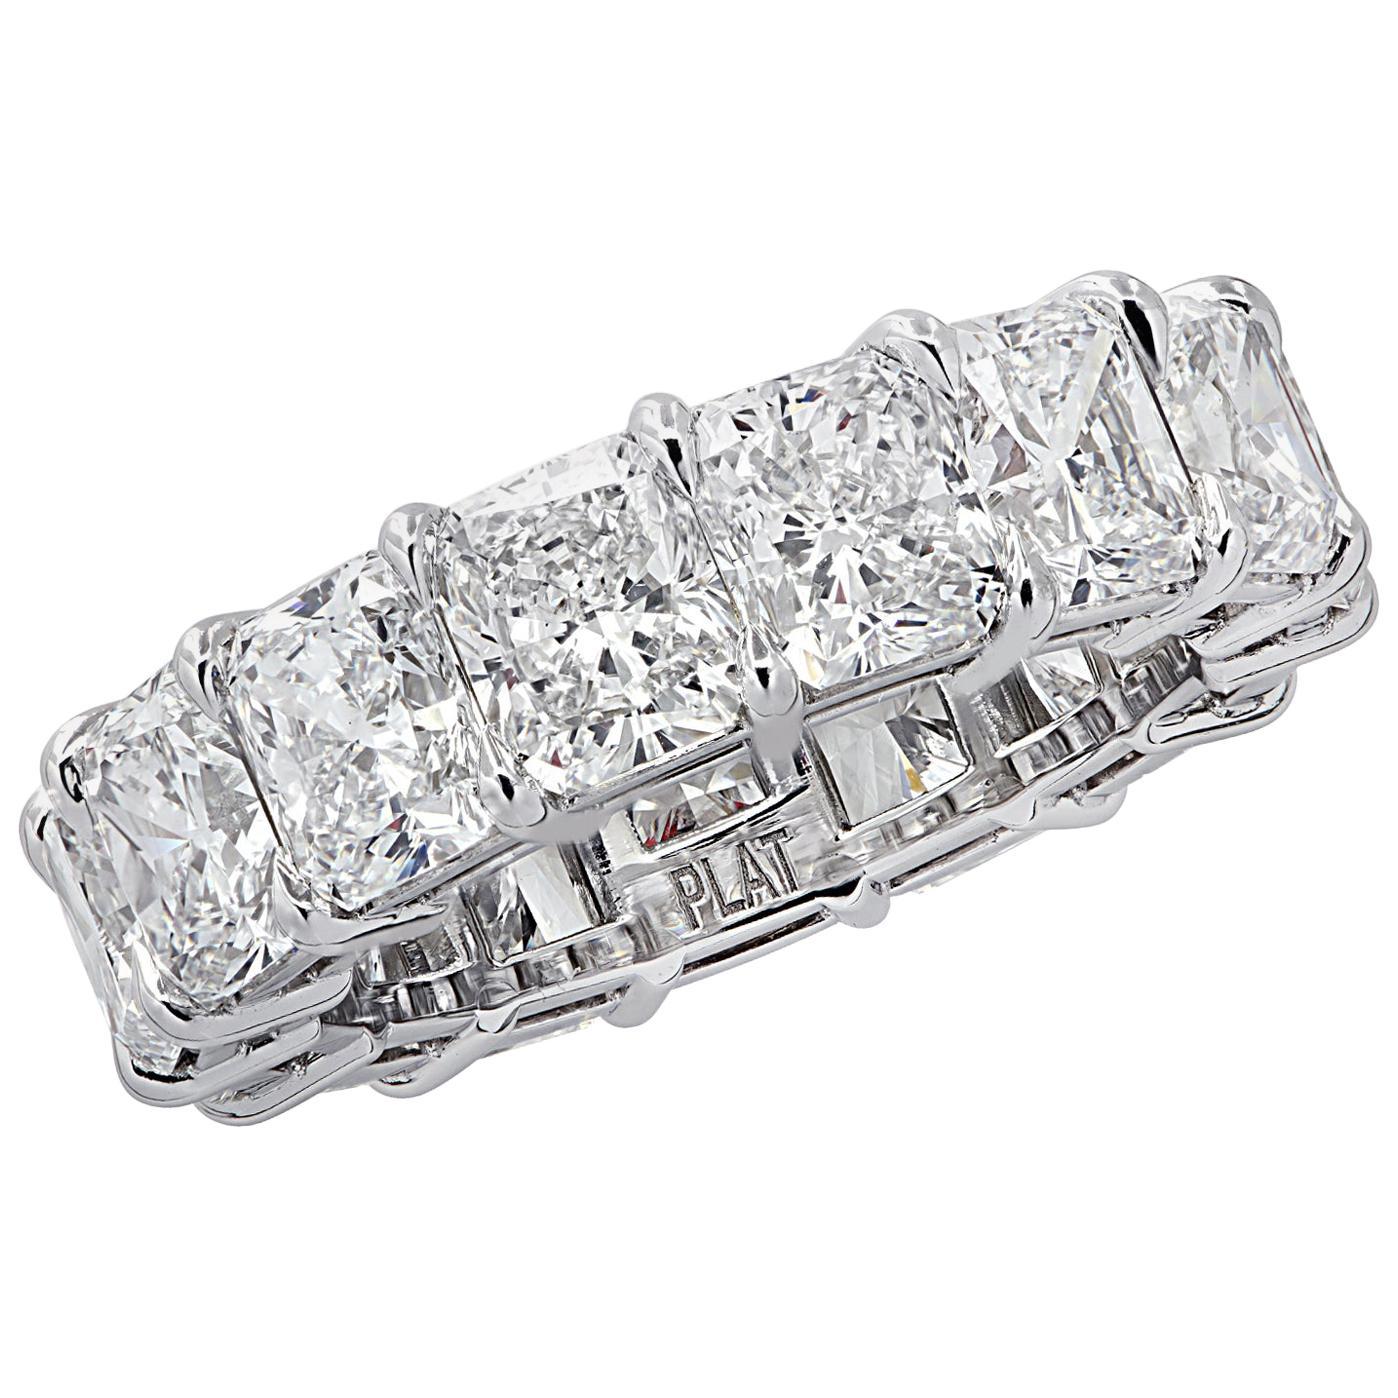 Vivid Diamonds 10.73 Carat Radiant Cut Diamond Eternity Band